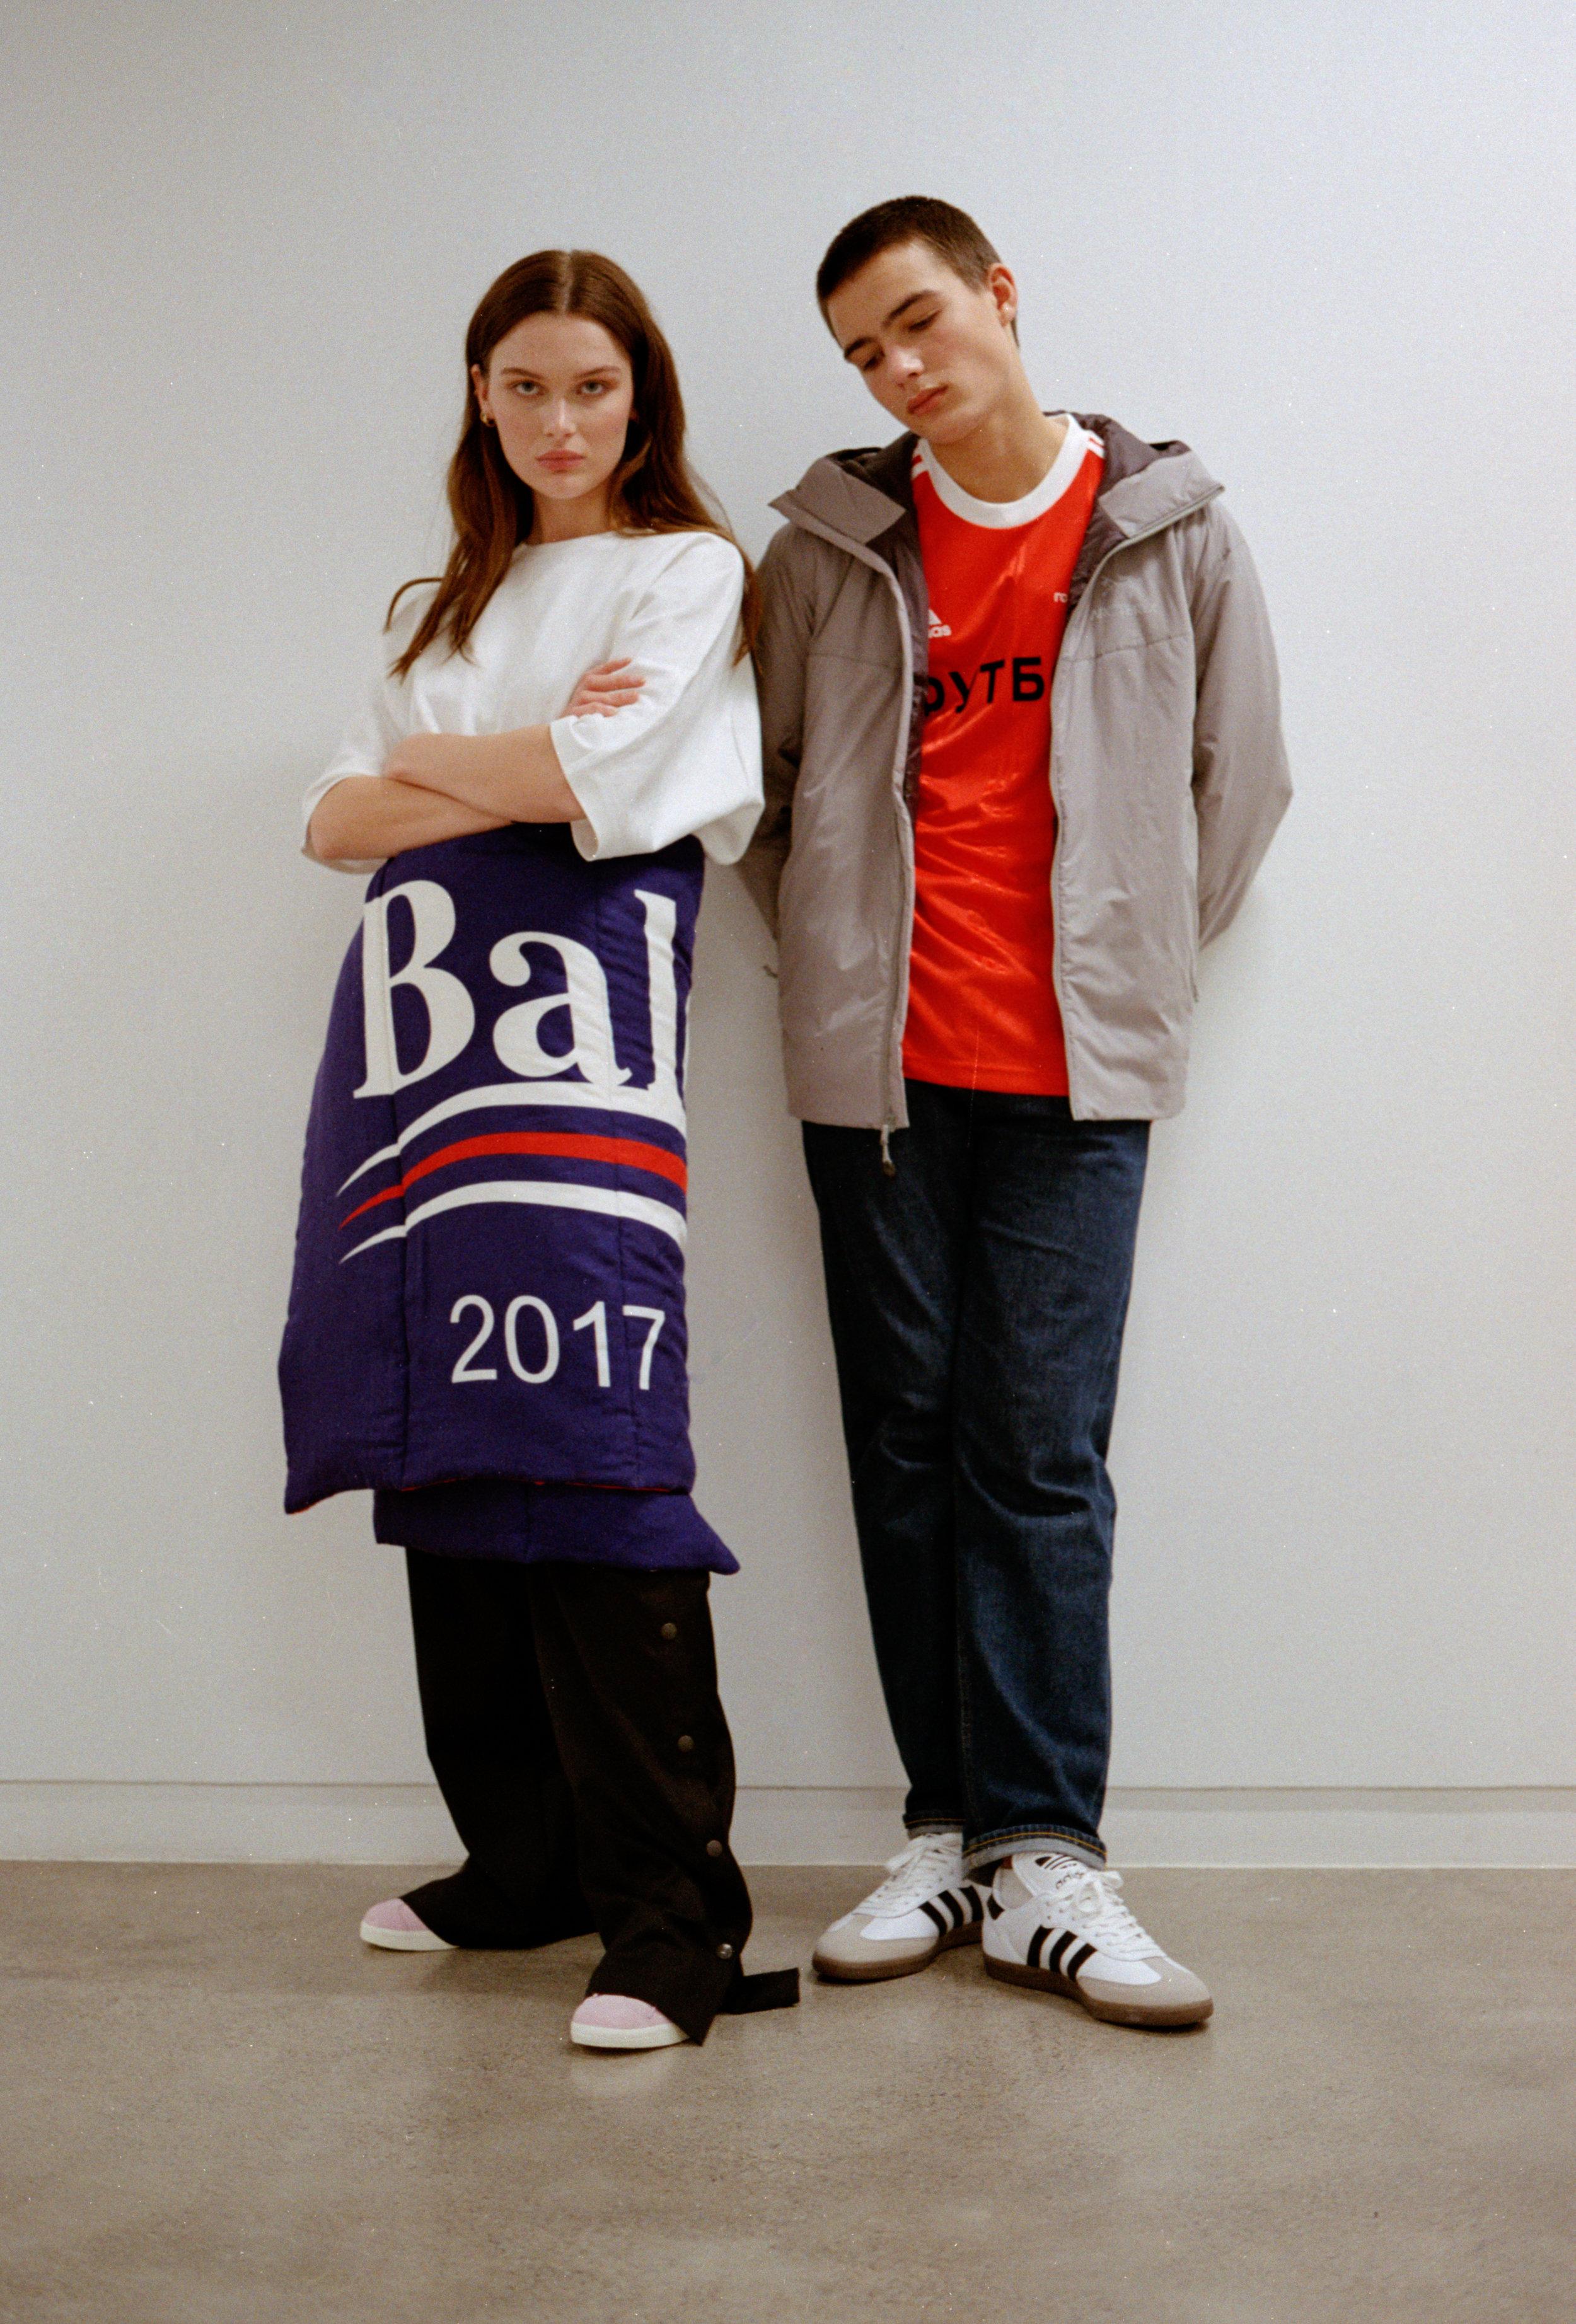 Pauline: T-skjorte ADIDAS Skjerf som skjørt BALENCIAGA Bukse ADIDAS Sko Adidas Kornelius: Jakke ARC'TERYX T-skjorte  GOSHA RUBCHINSKIY Bukse LEE Sko ADIDAS